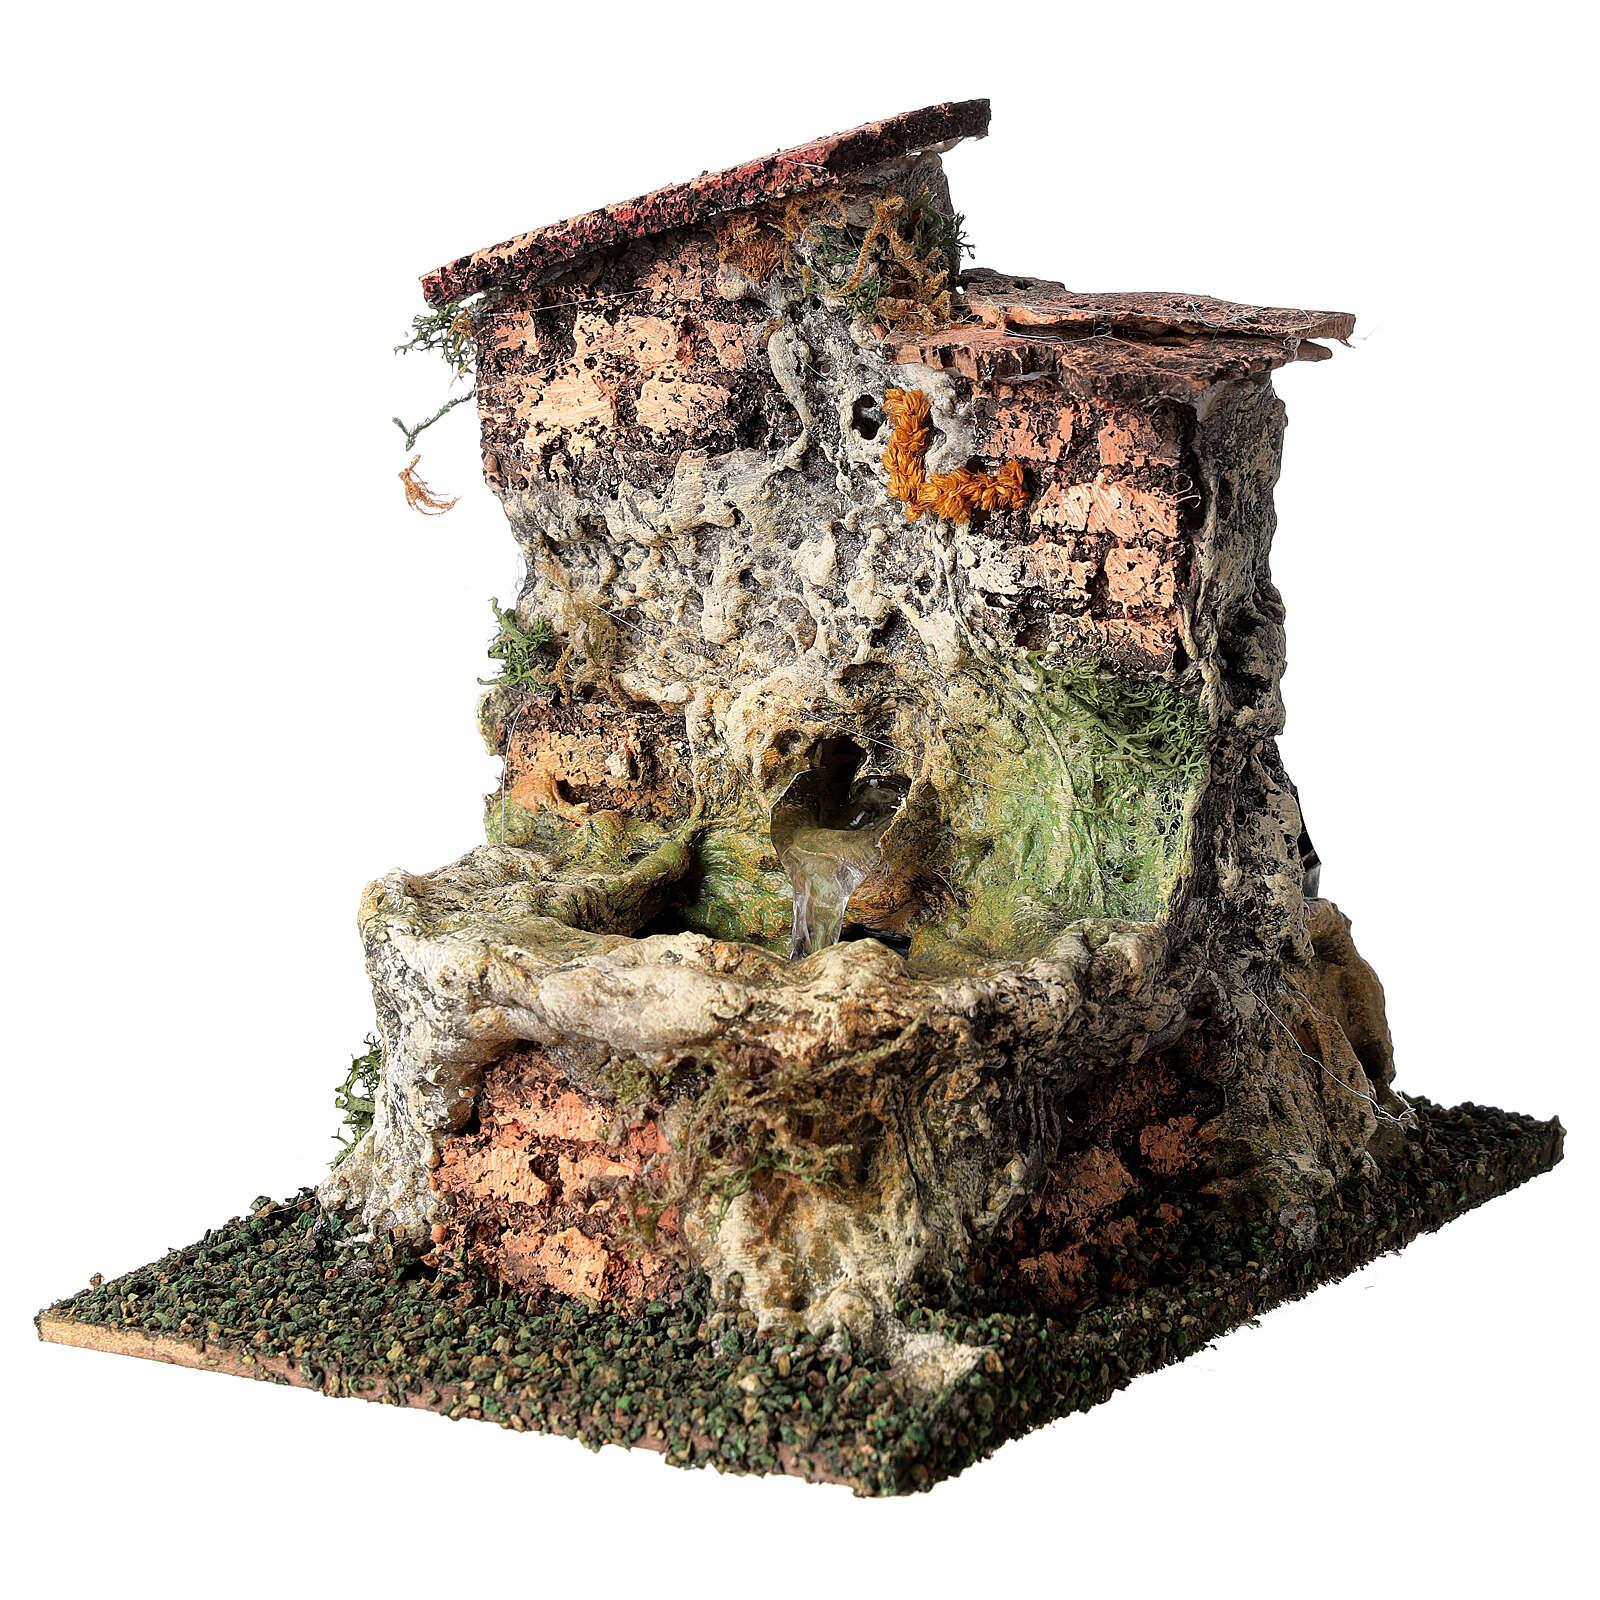 Working fountain with jug Nativity scene 10-12 cm 4